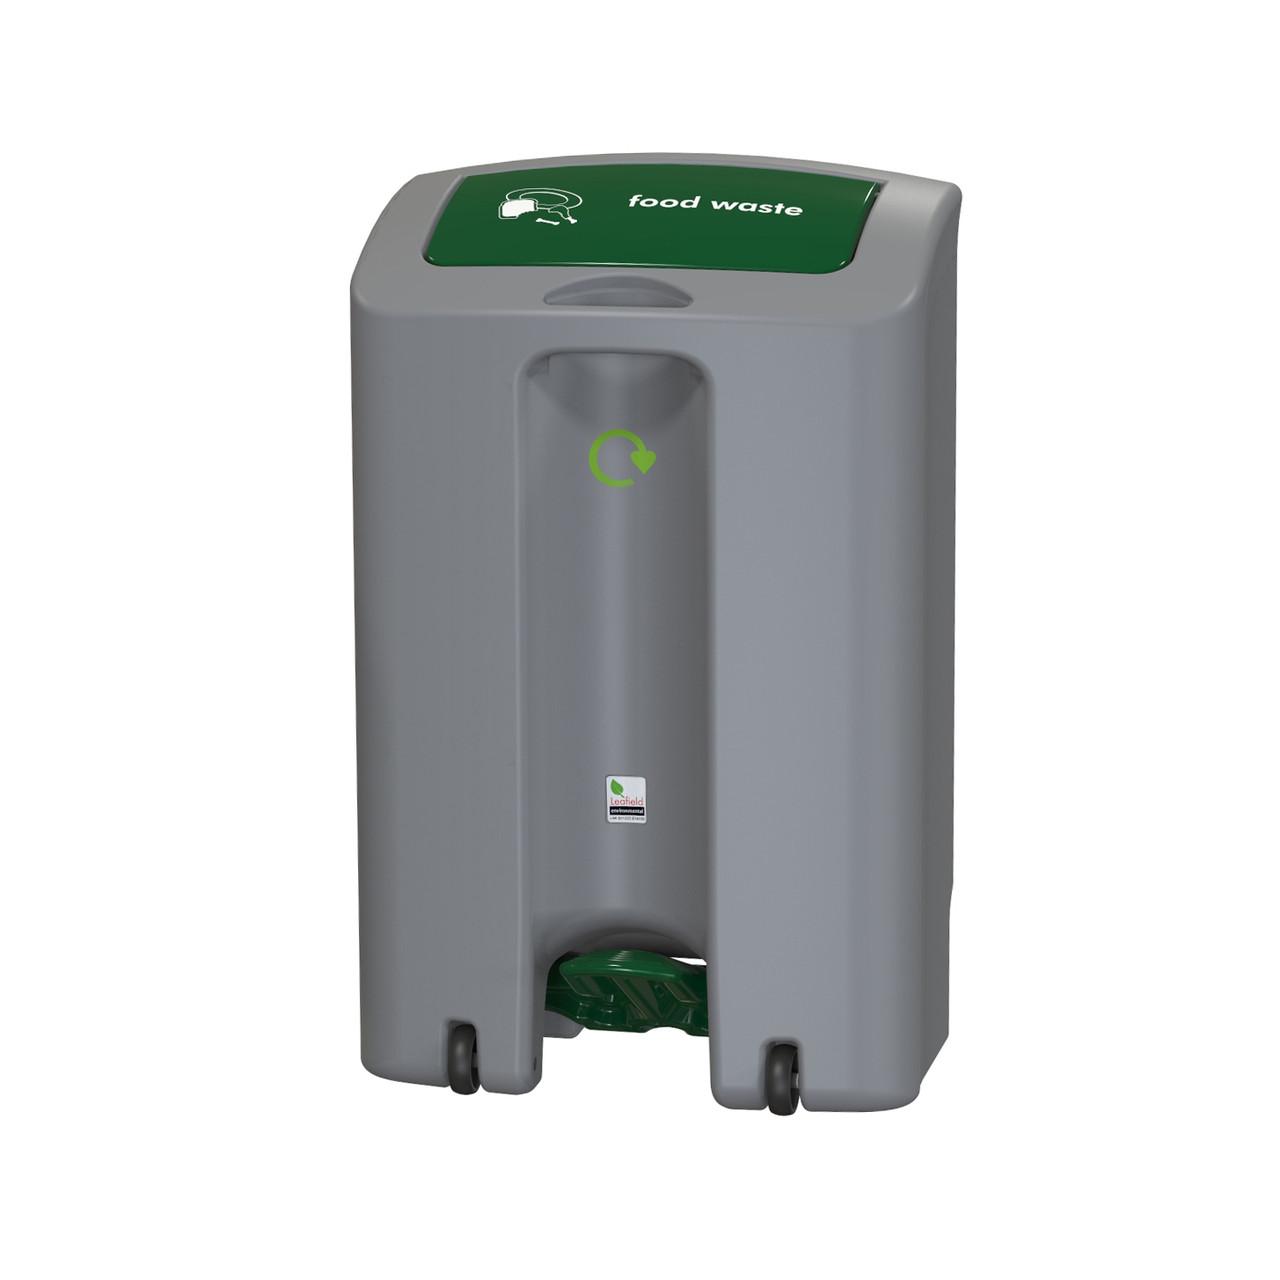 EnviroStep Peddle Recycling Litter Bin 65 Litre